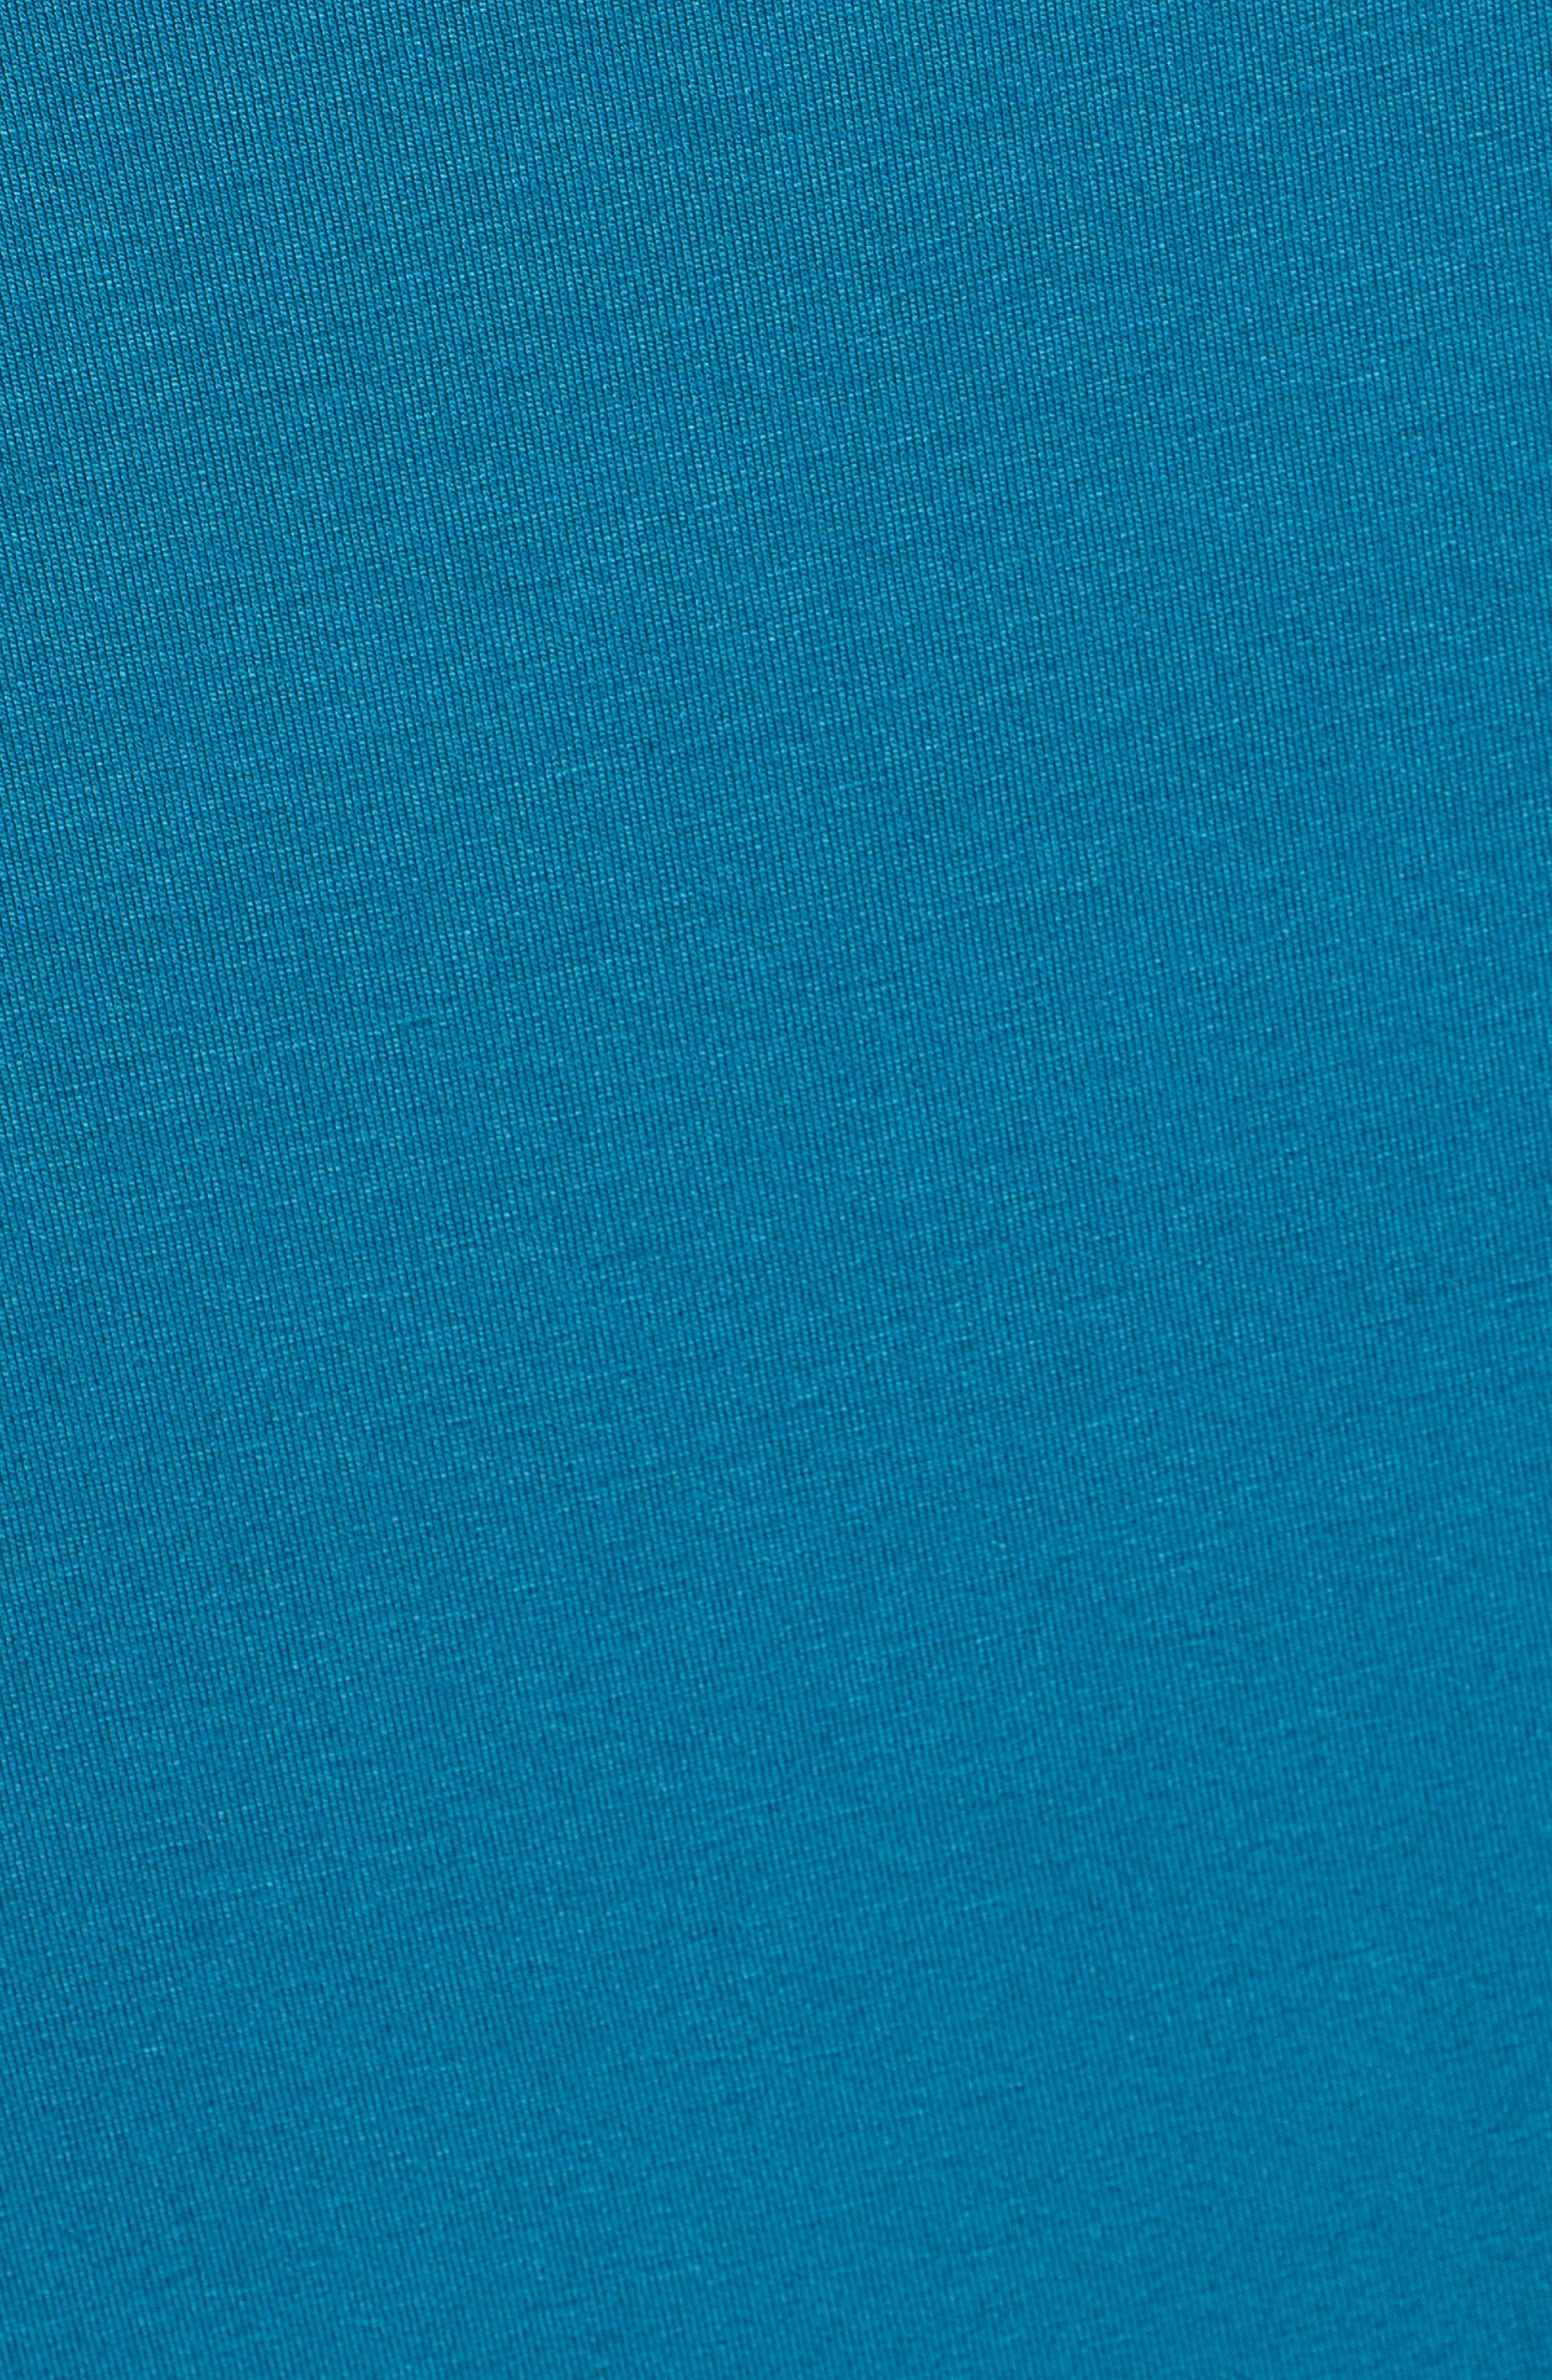 Jersey Asymmetrical A-Line Dress,                             Alternate thumbnail 23, color,